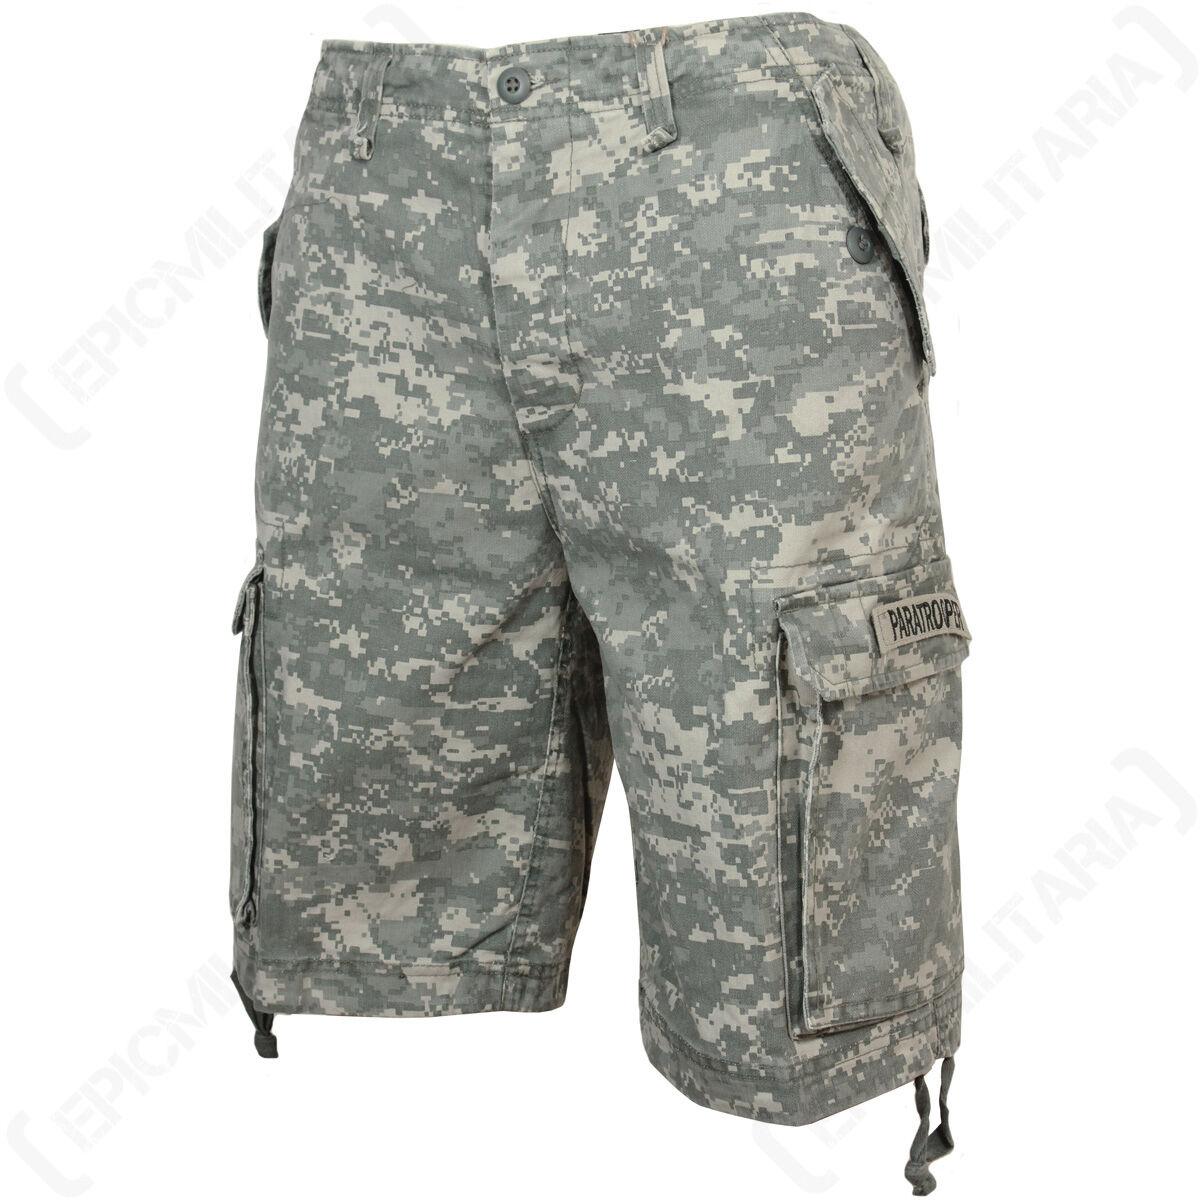 AT-DIGITAL Camo Paratrooper Shorts - Military Army Combat Mens Prewashed Cotton